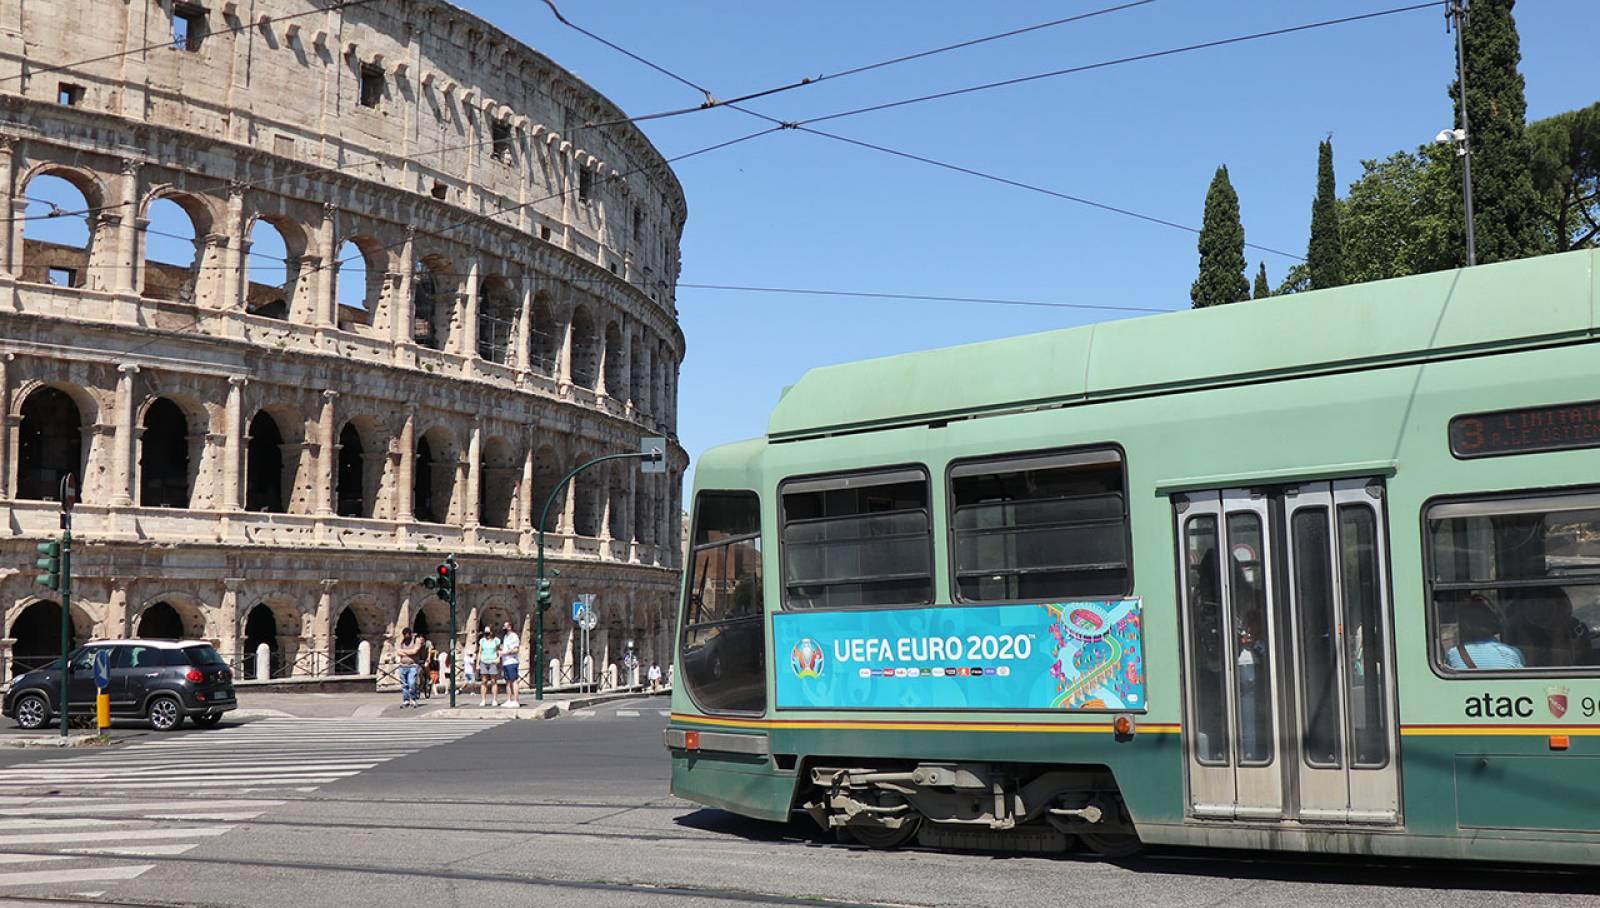 Pubblicità su tram IGPDecaux Roma Side Banner per UEFA 2020